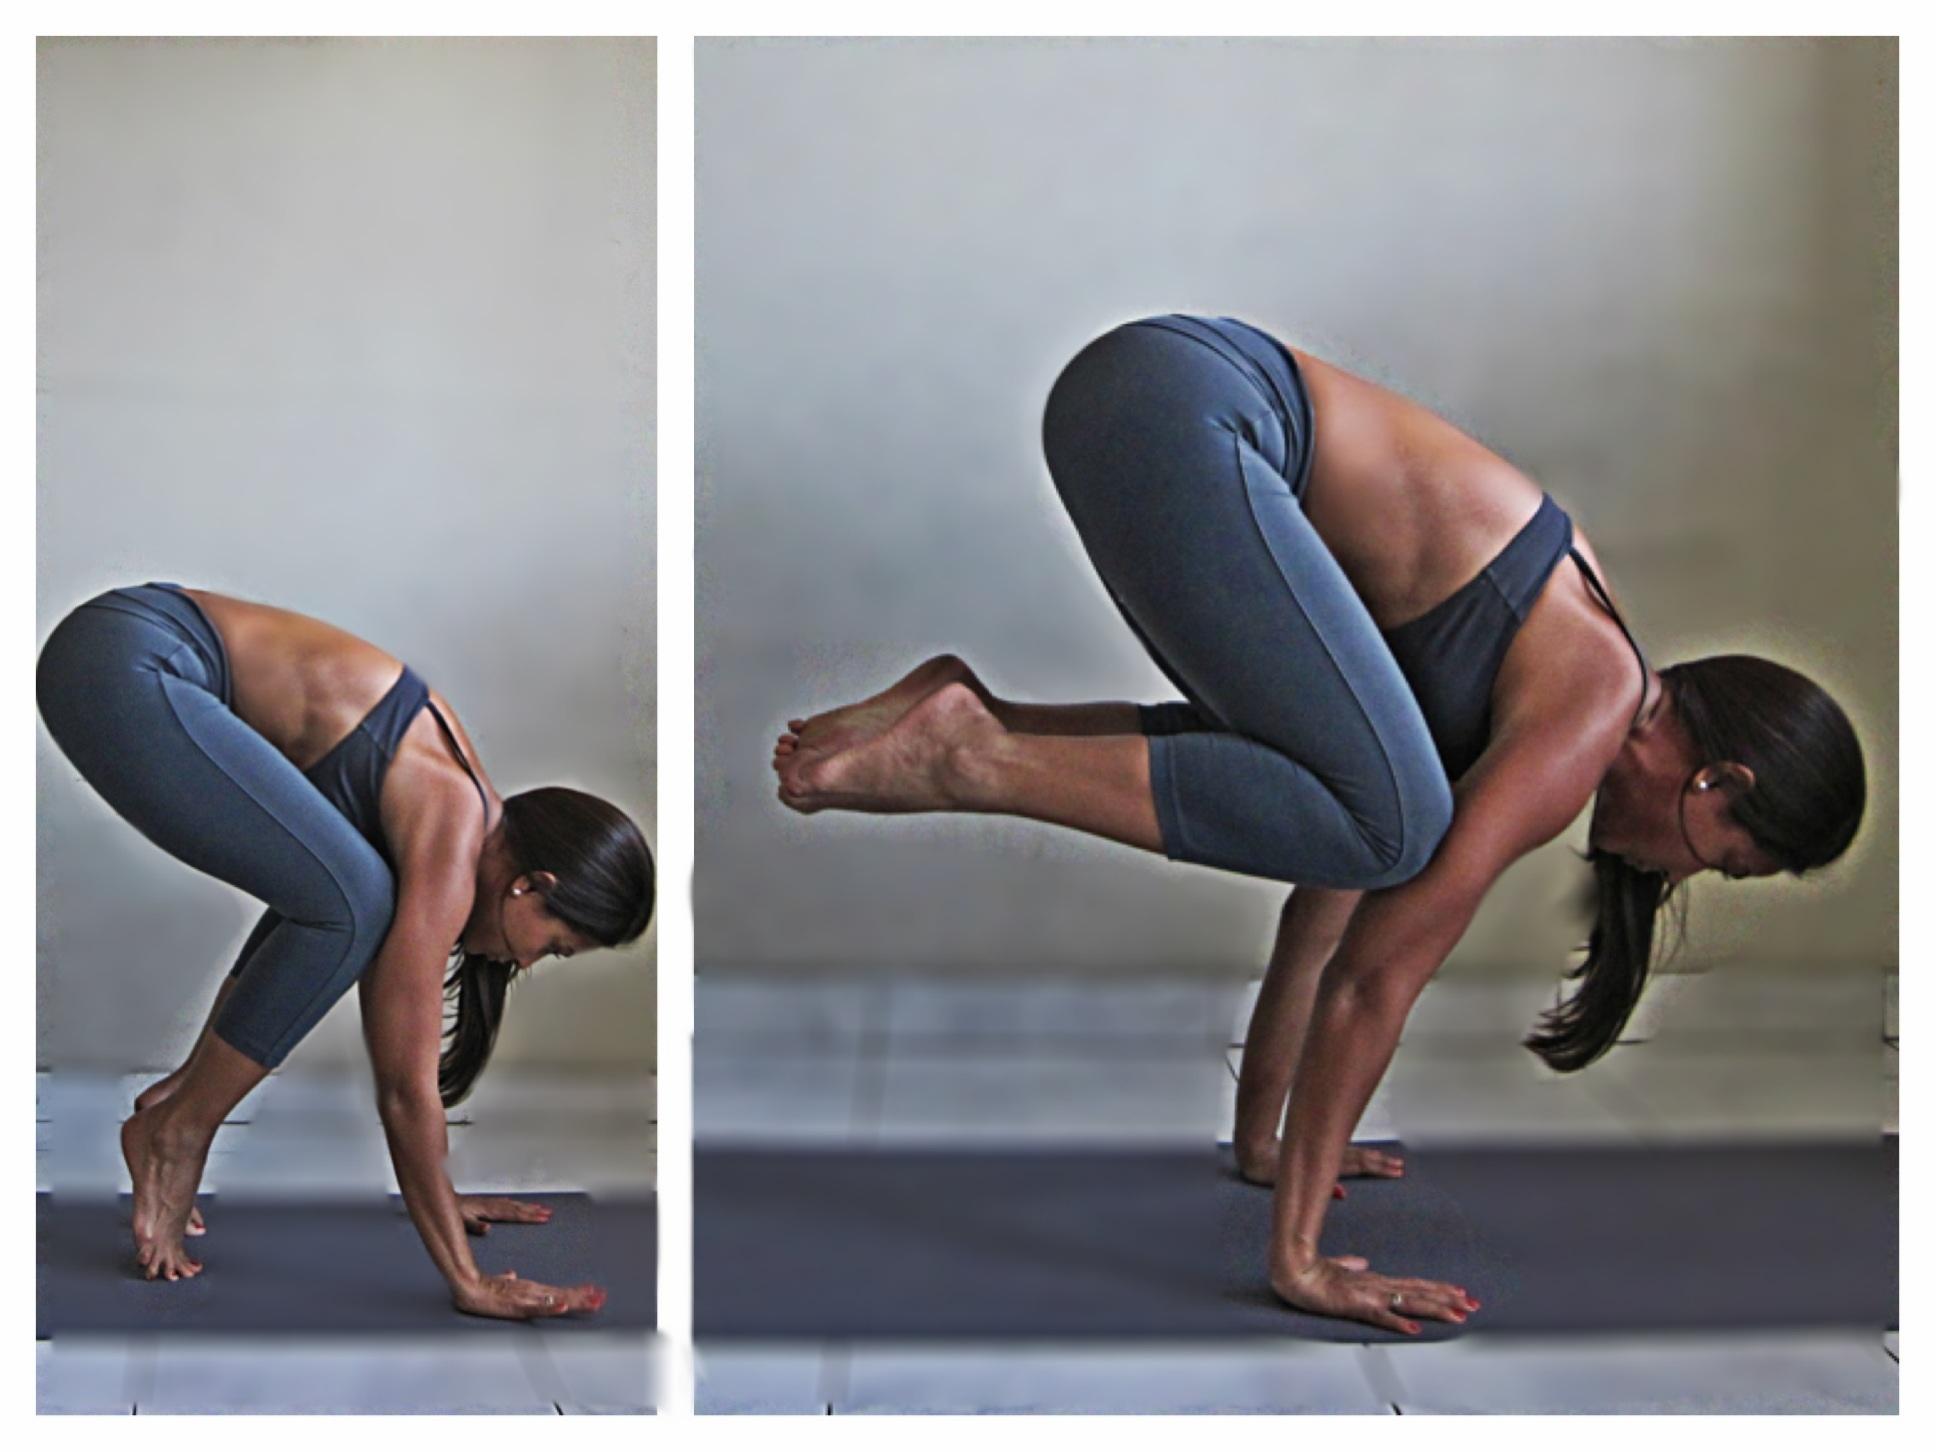 Yoga Poses - Crane Pose